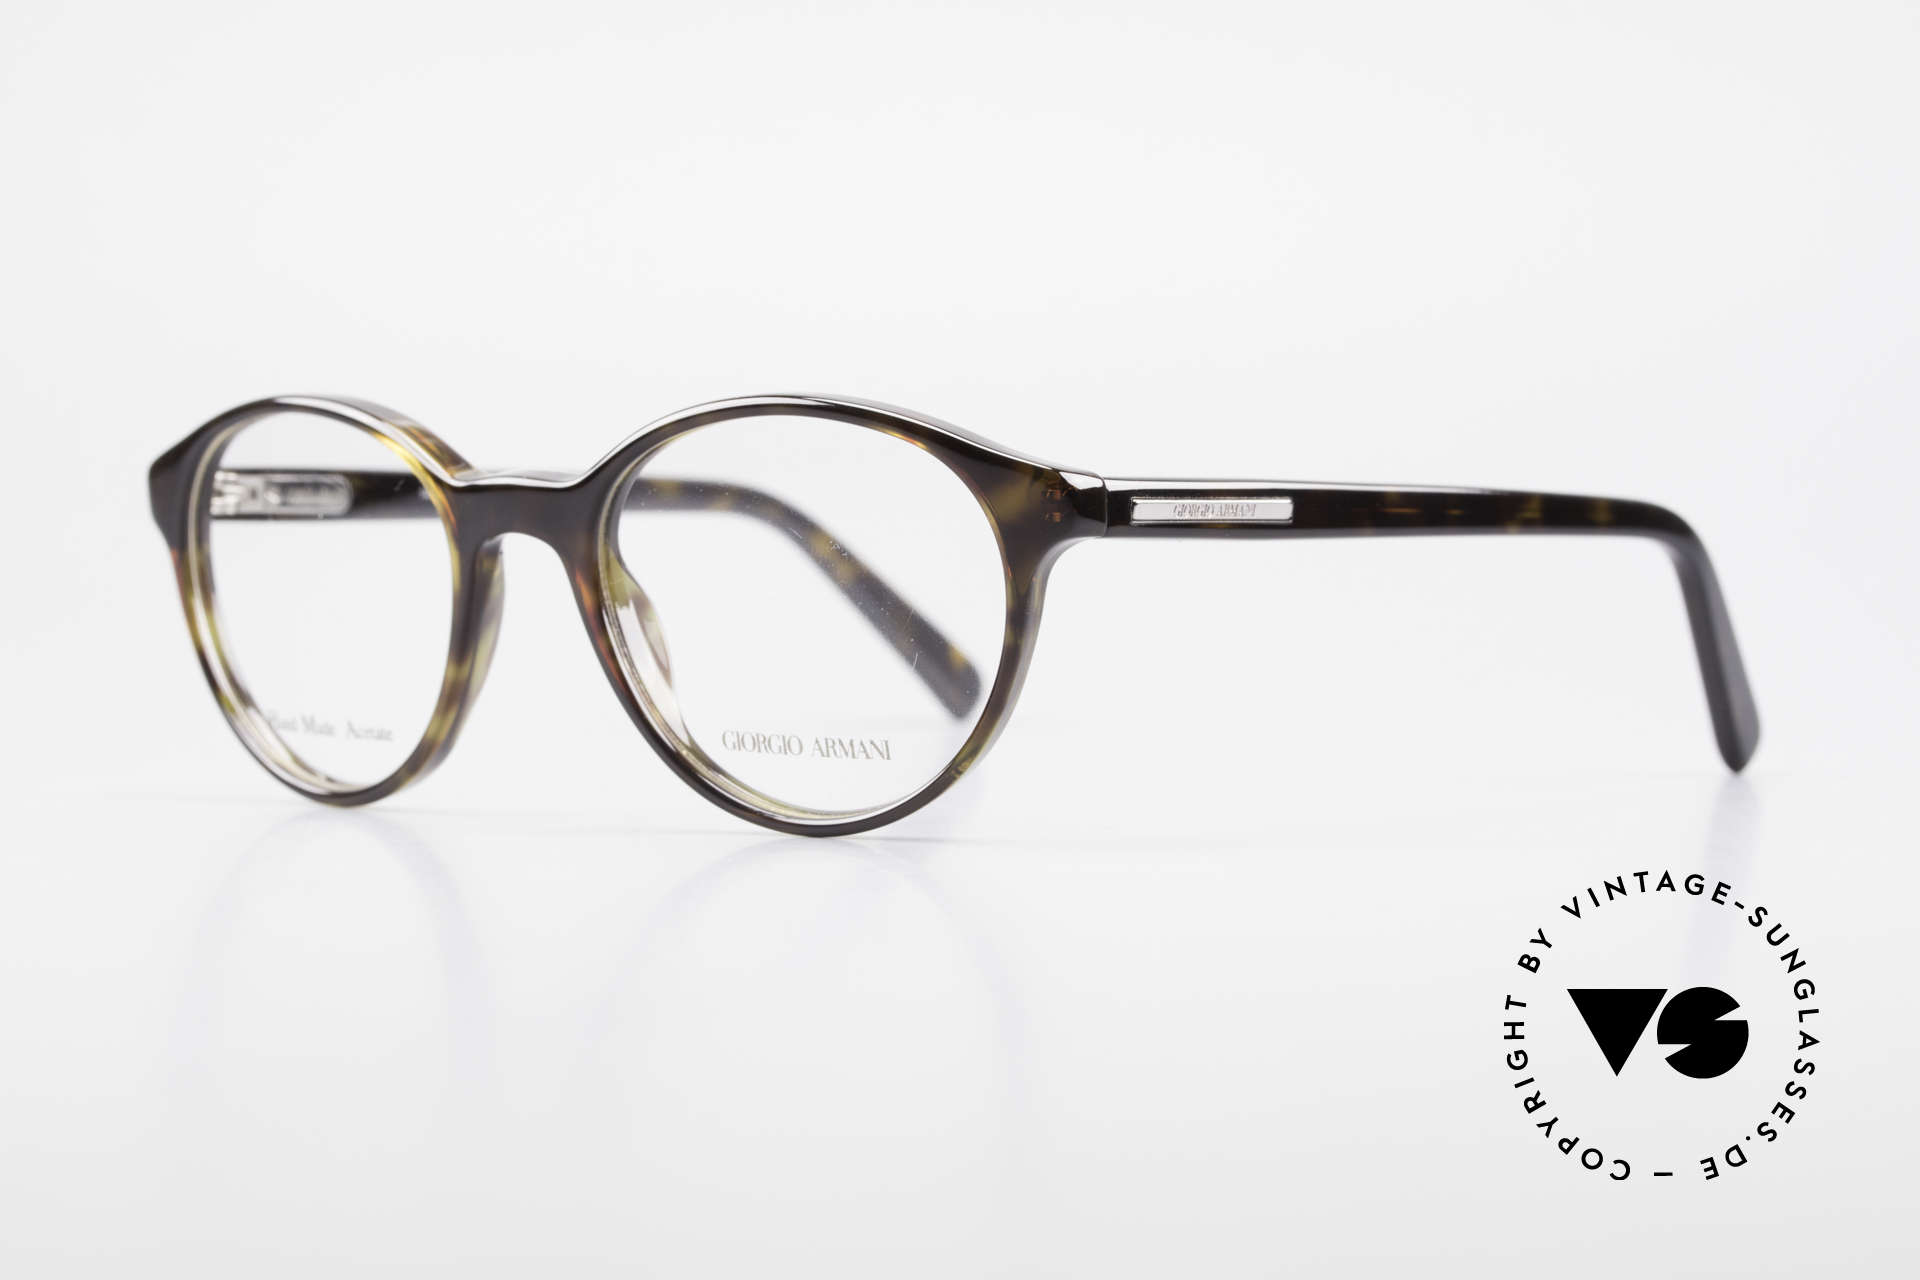 Giorgio Armani 467 Unisex Panto Eyeglass-Frame, unisex Panto model with flexible spring hinges, Made for Men and Women